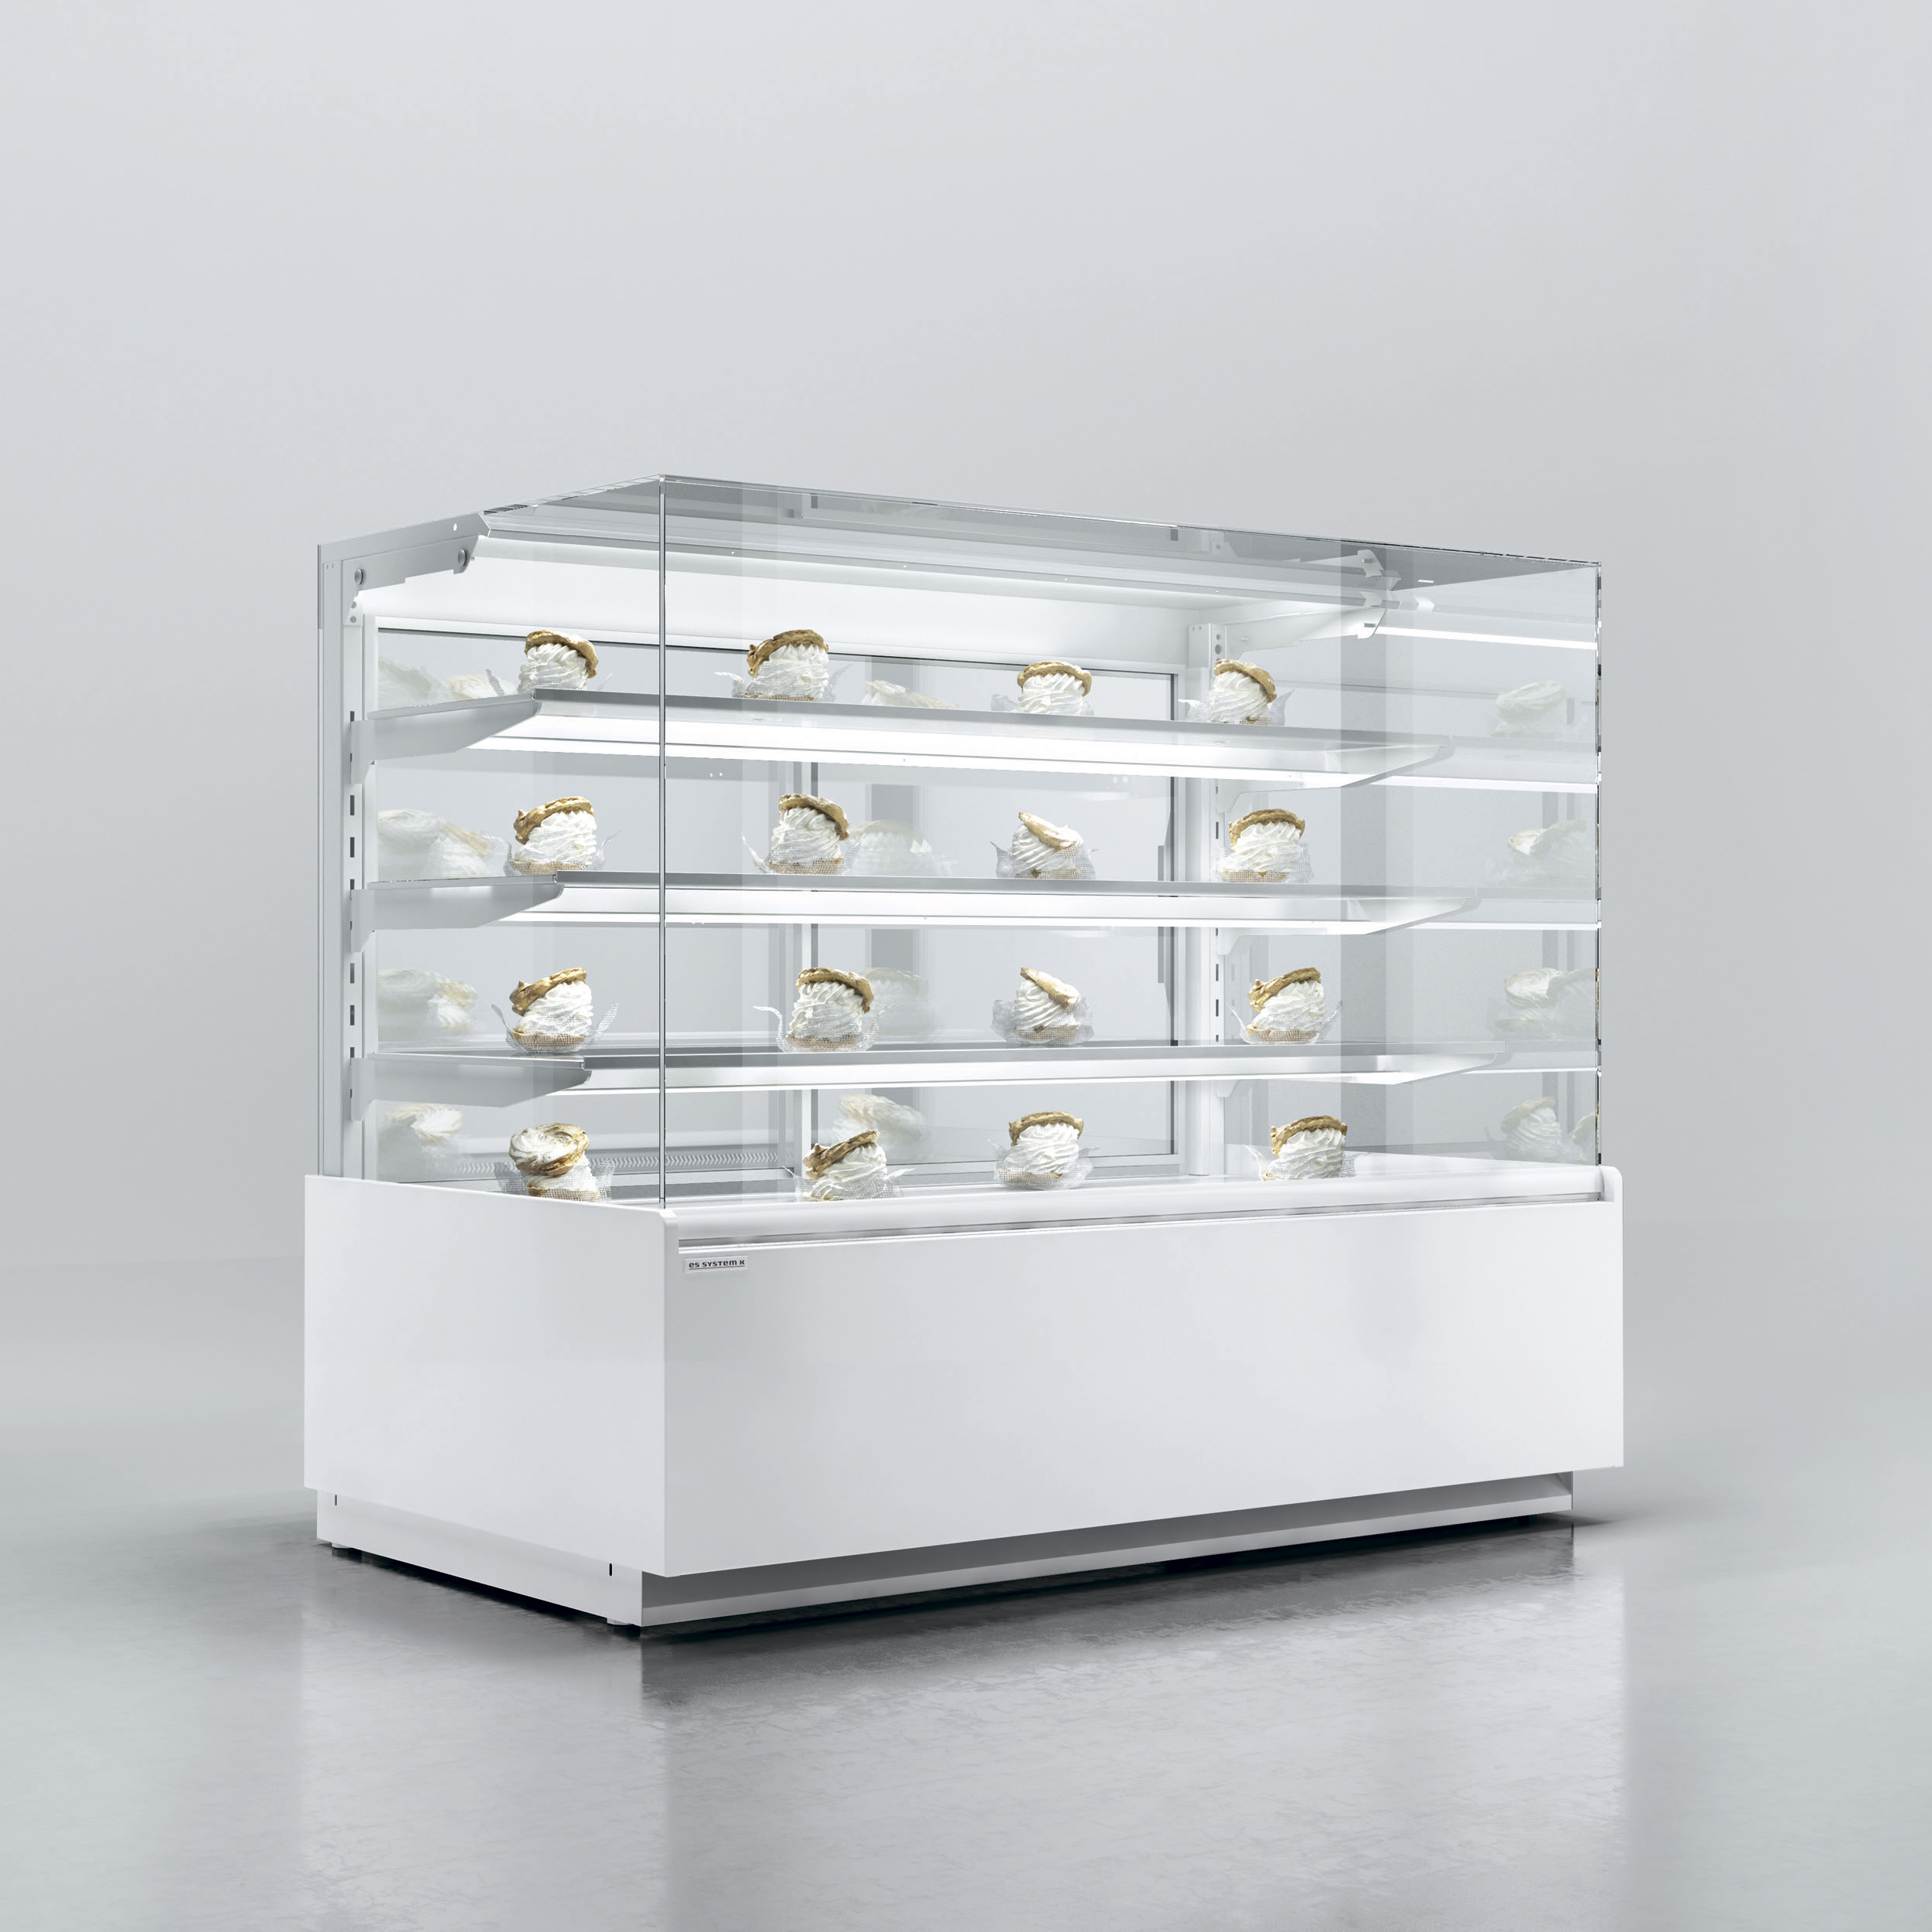 Витрина холодильная ES SYSTEM K LCC Carina 04 1,0